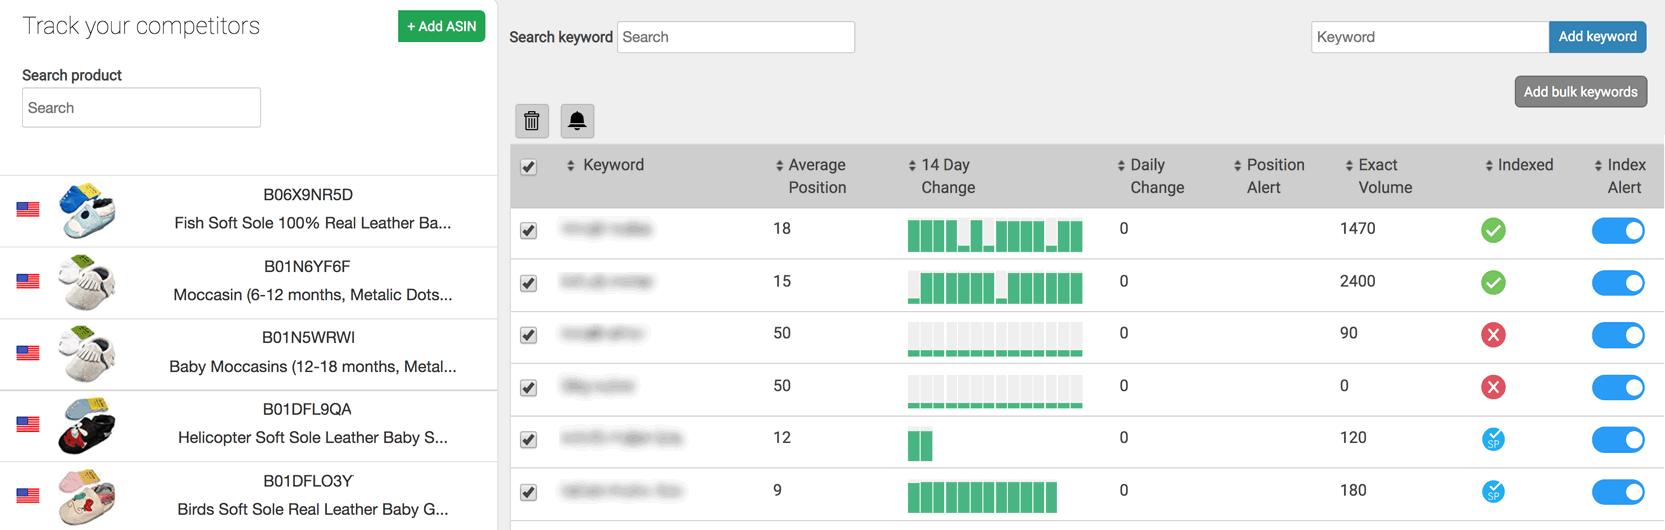 amazon keyword tracker tool